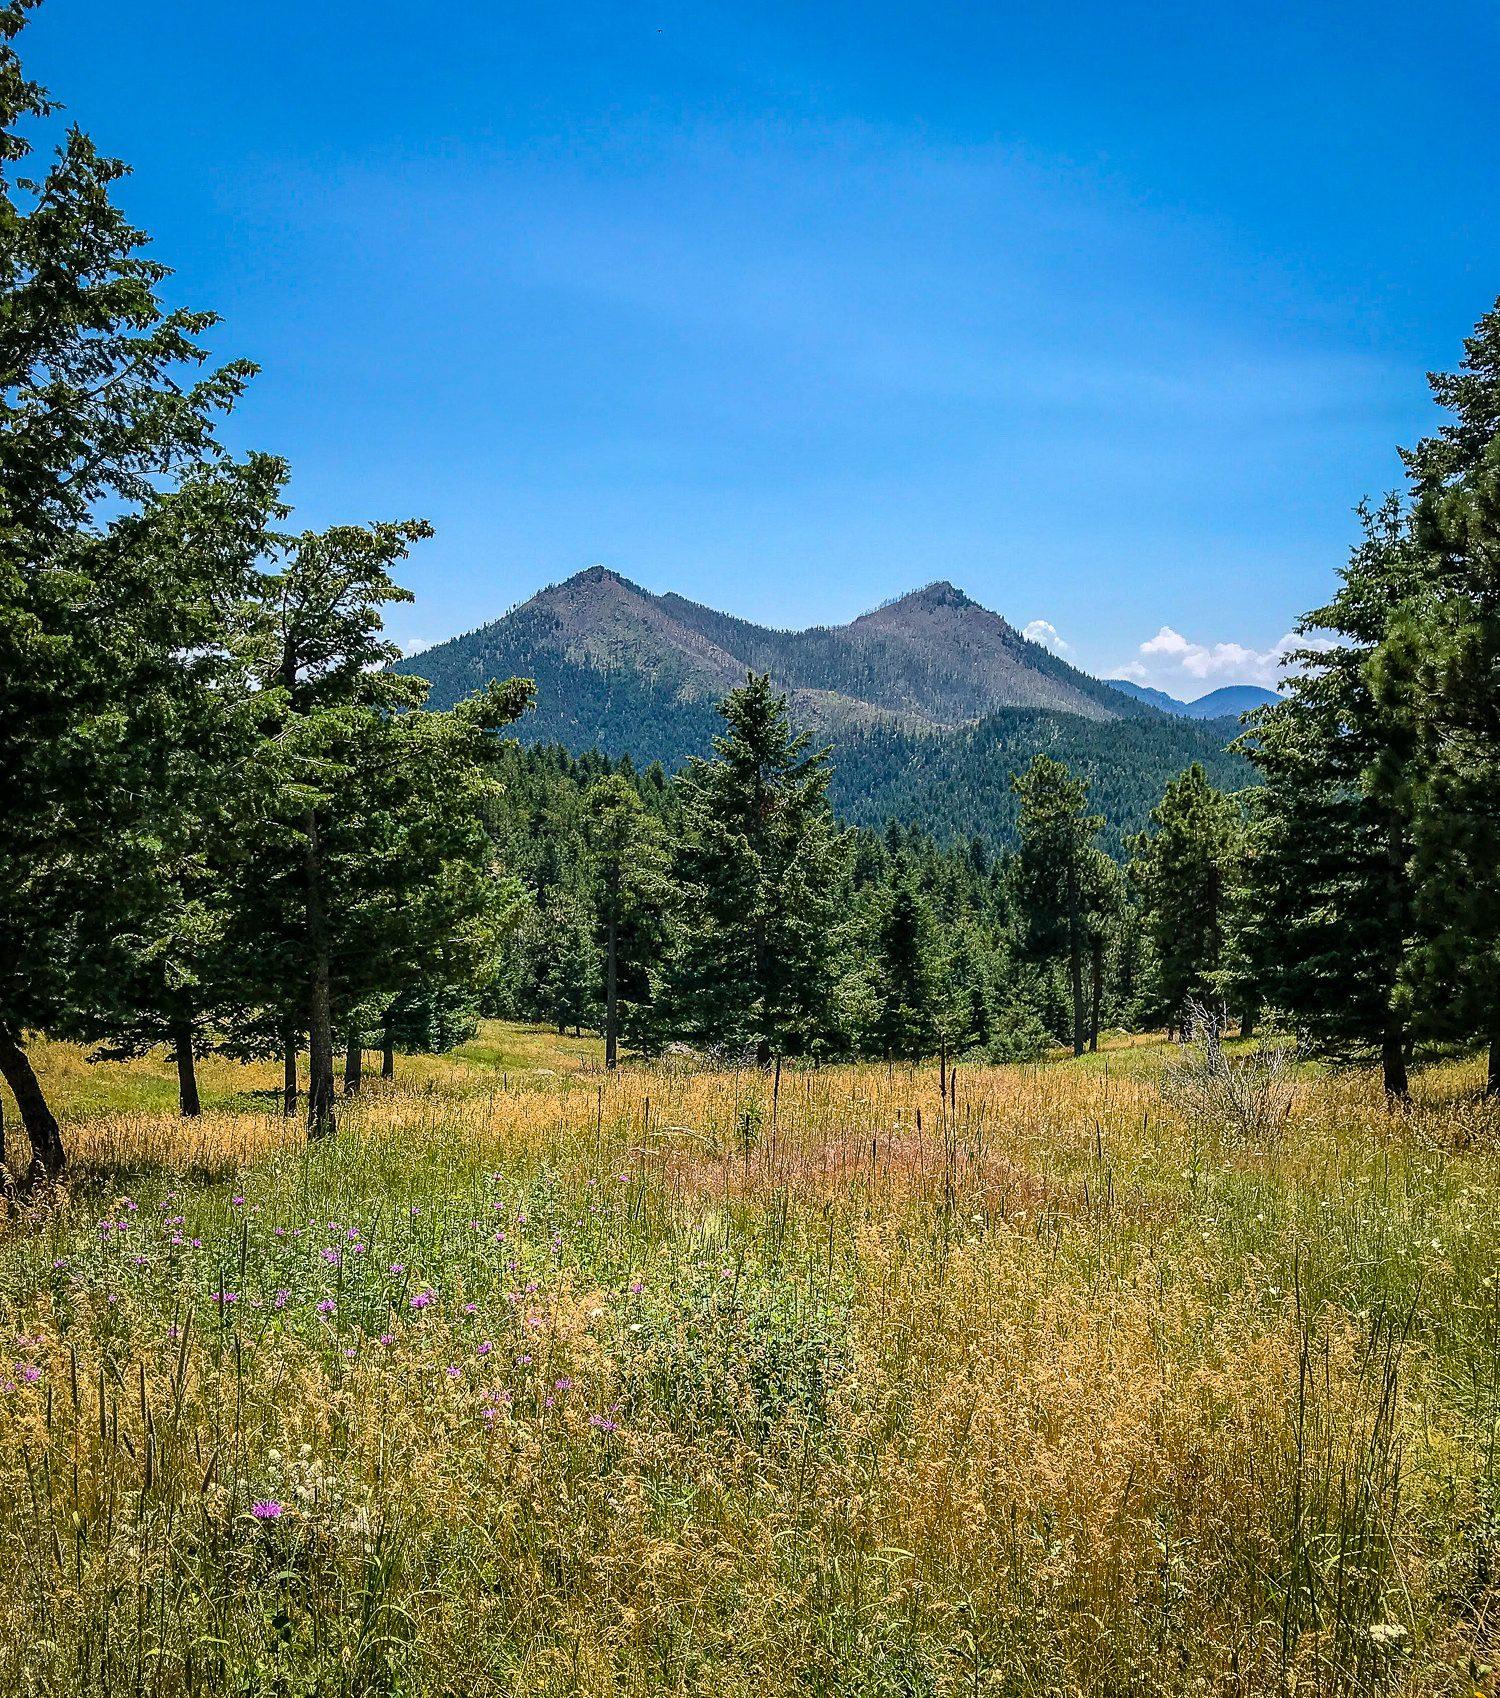 Twin peak mountains seen during Boulder hikes